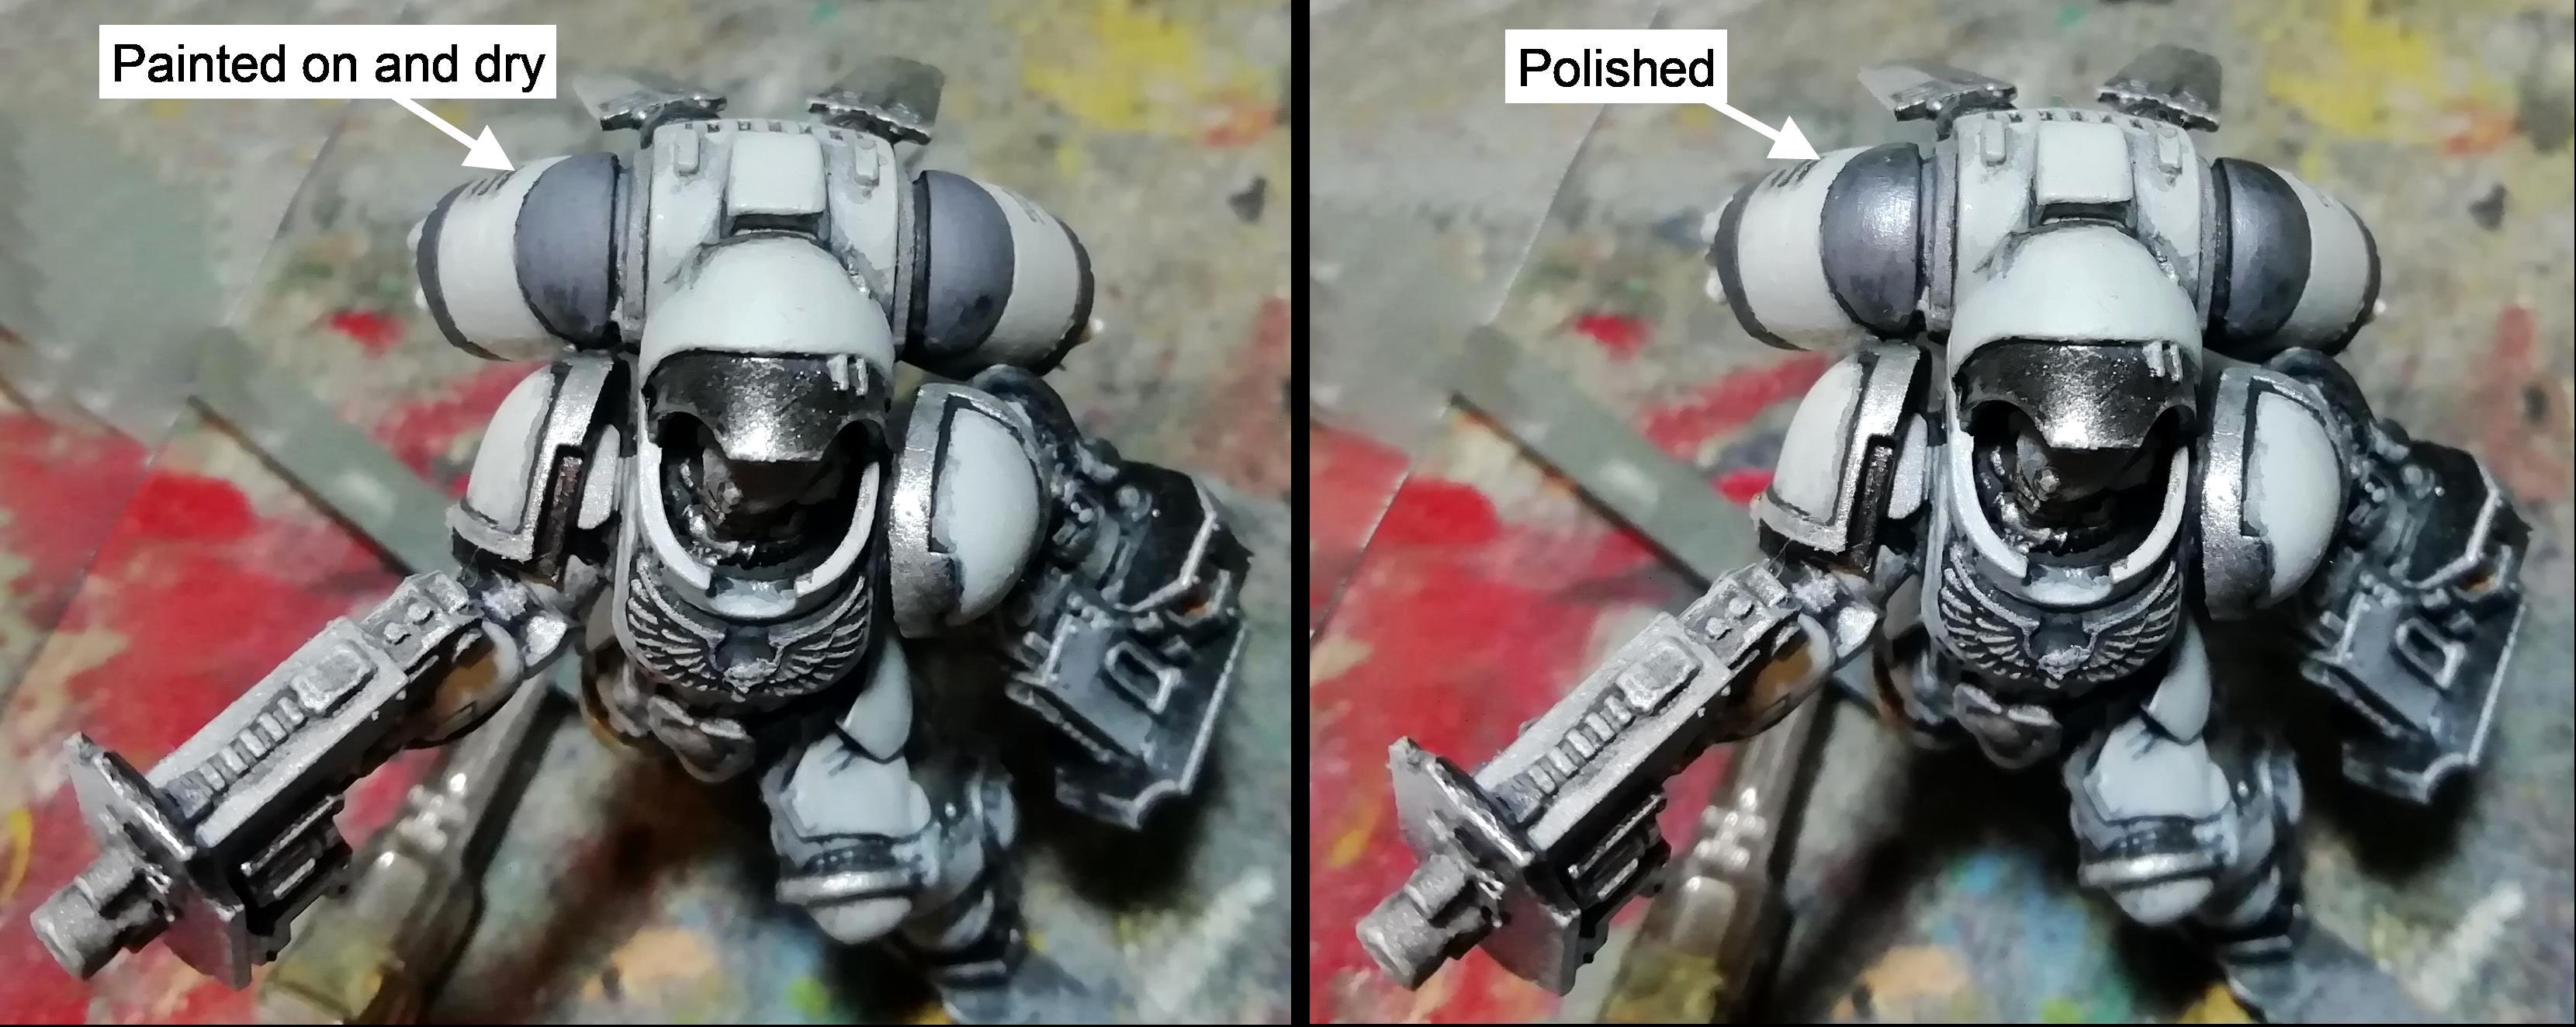 Incepror pip 5; polishing paint